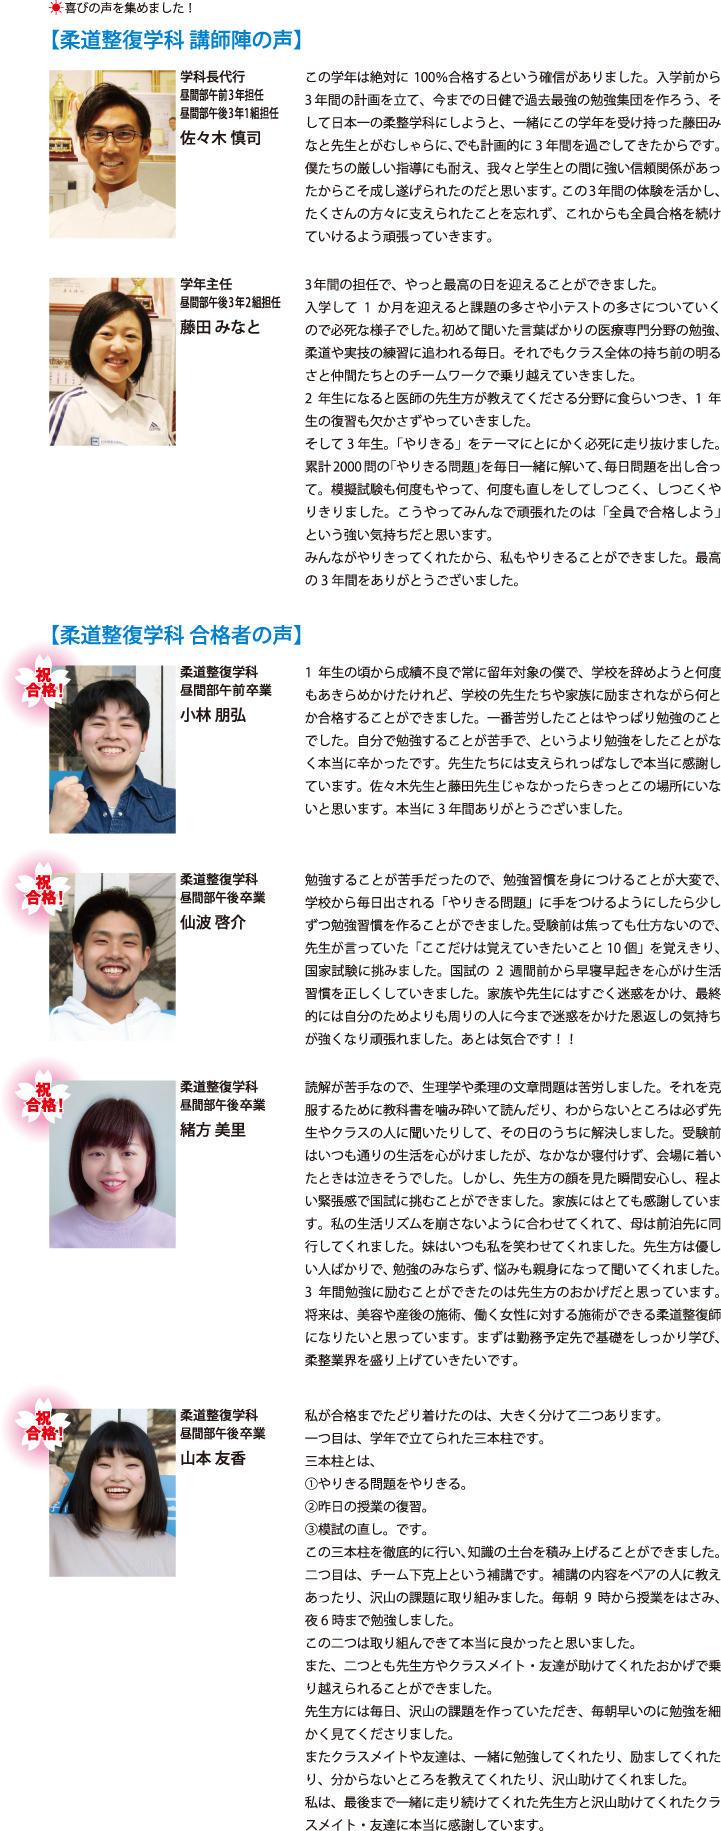 NEWS_2p.jpg